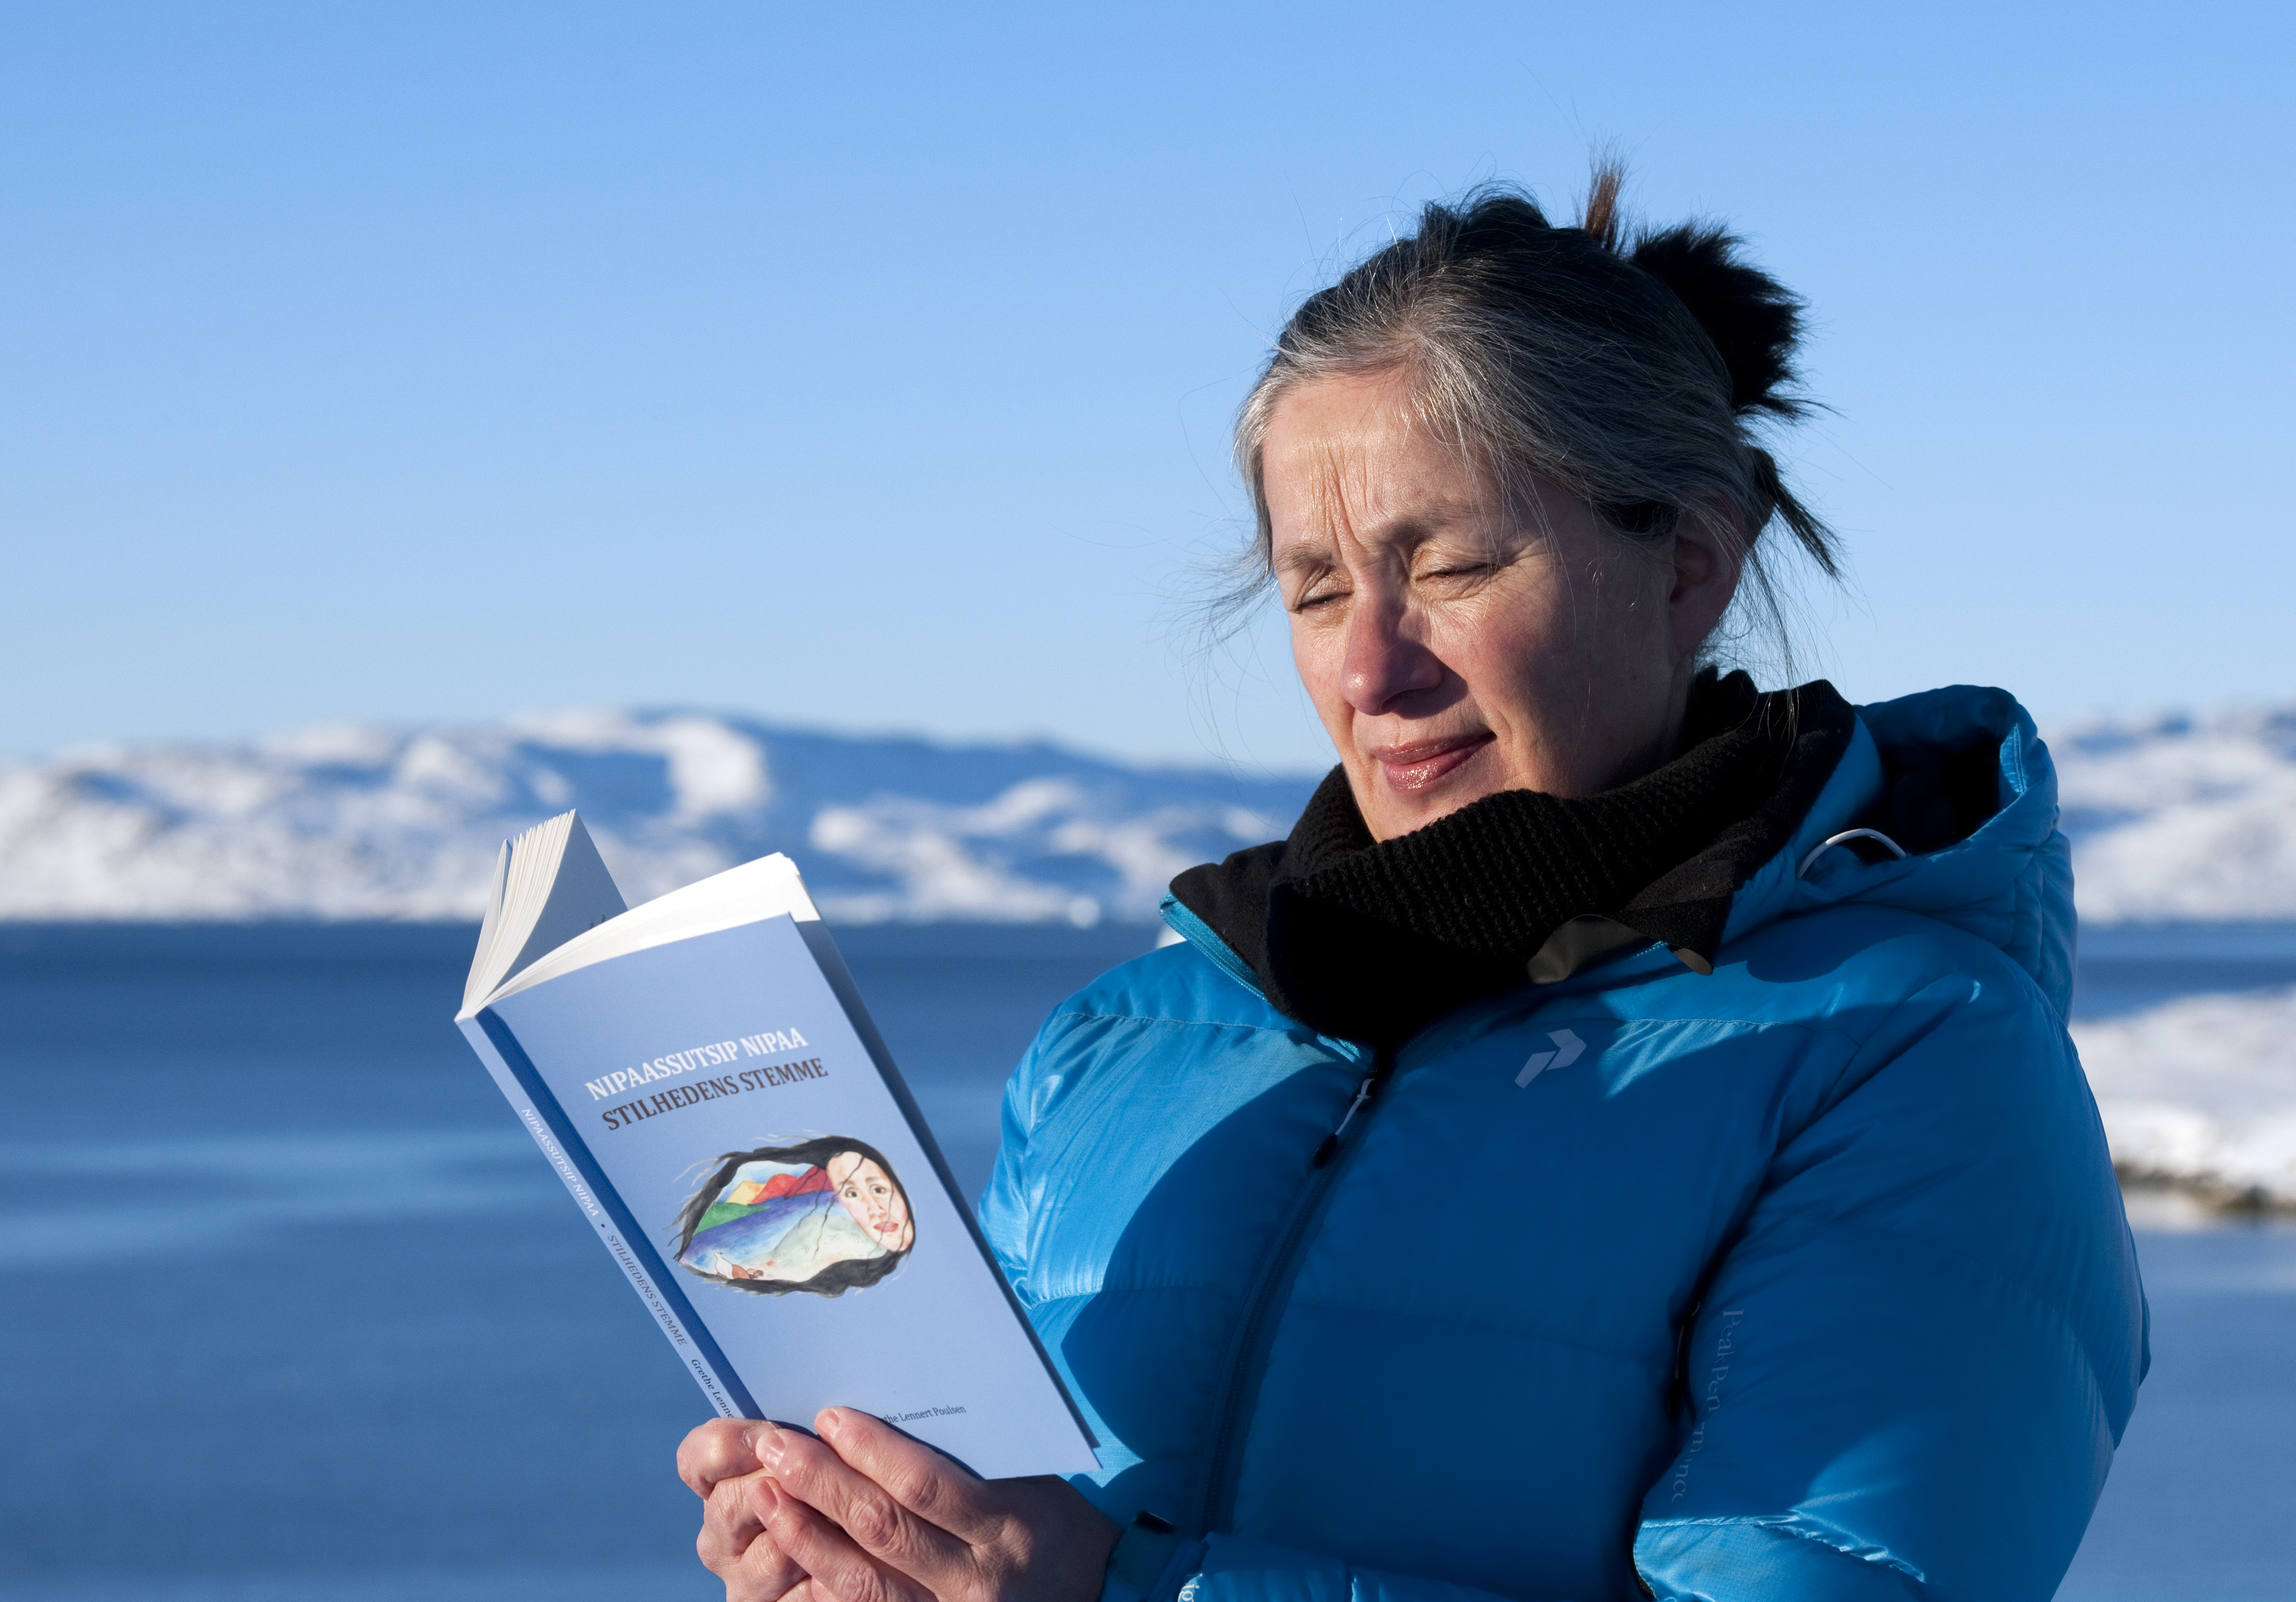 Debuterende digter fra Narsaq: Tal sammen! | Sermitsiaq.AG